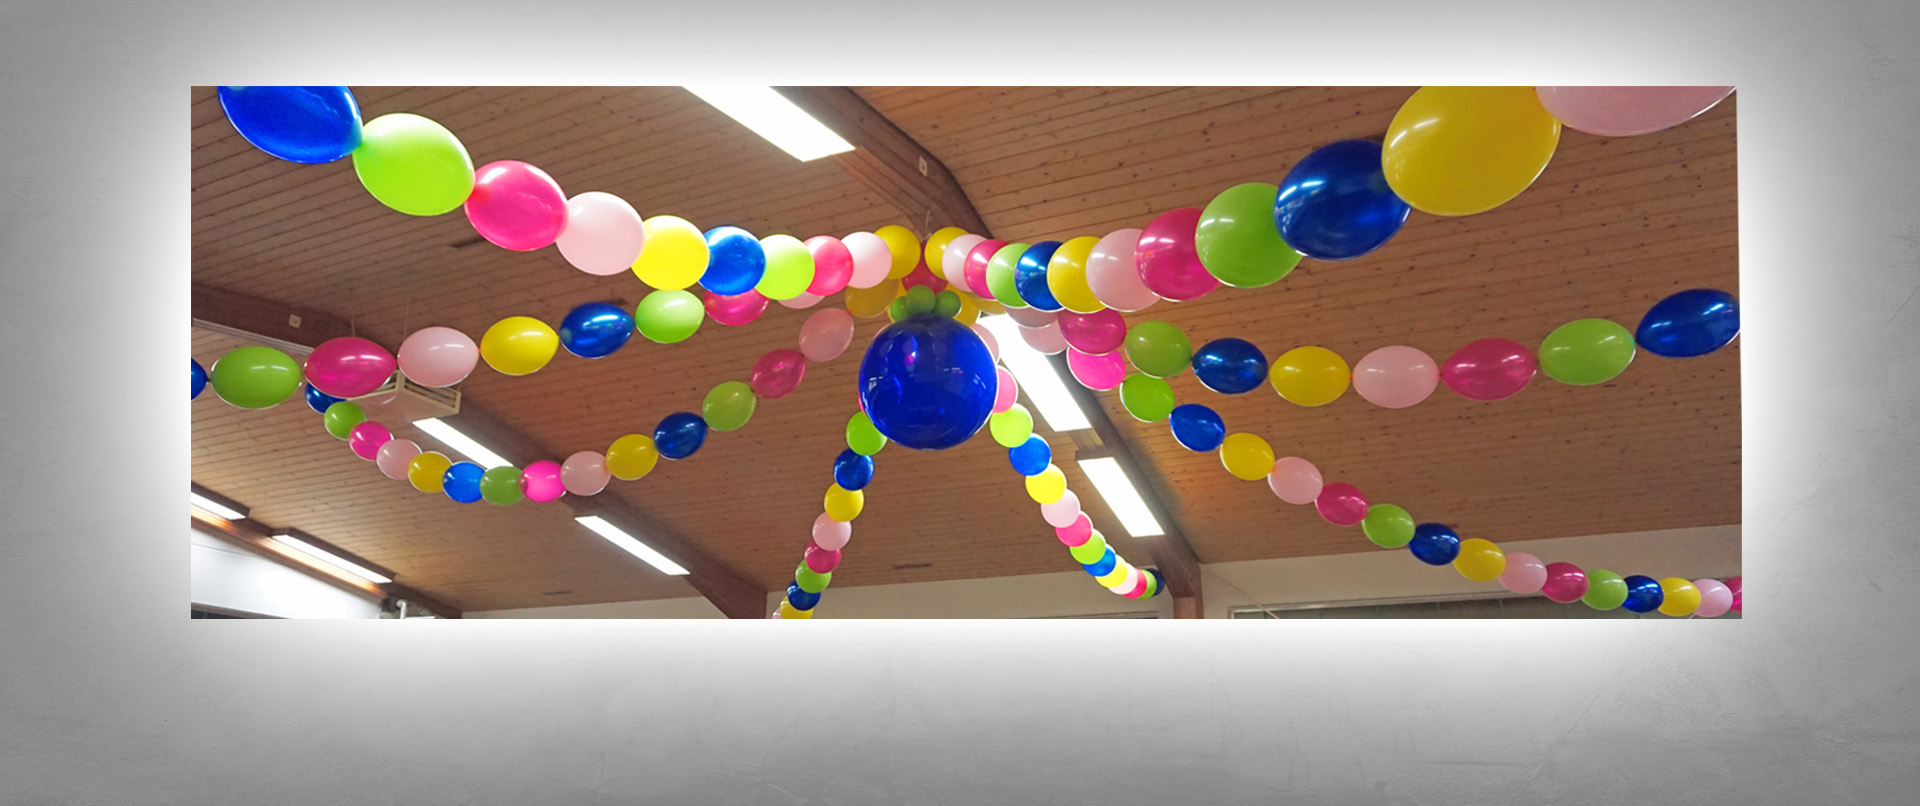 Luftballon-Dekoration Faschingssitzung NCZ Zimmern